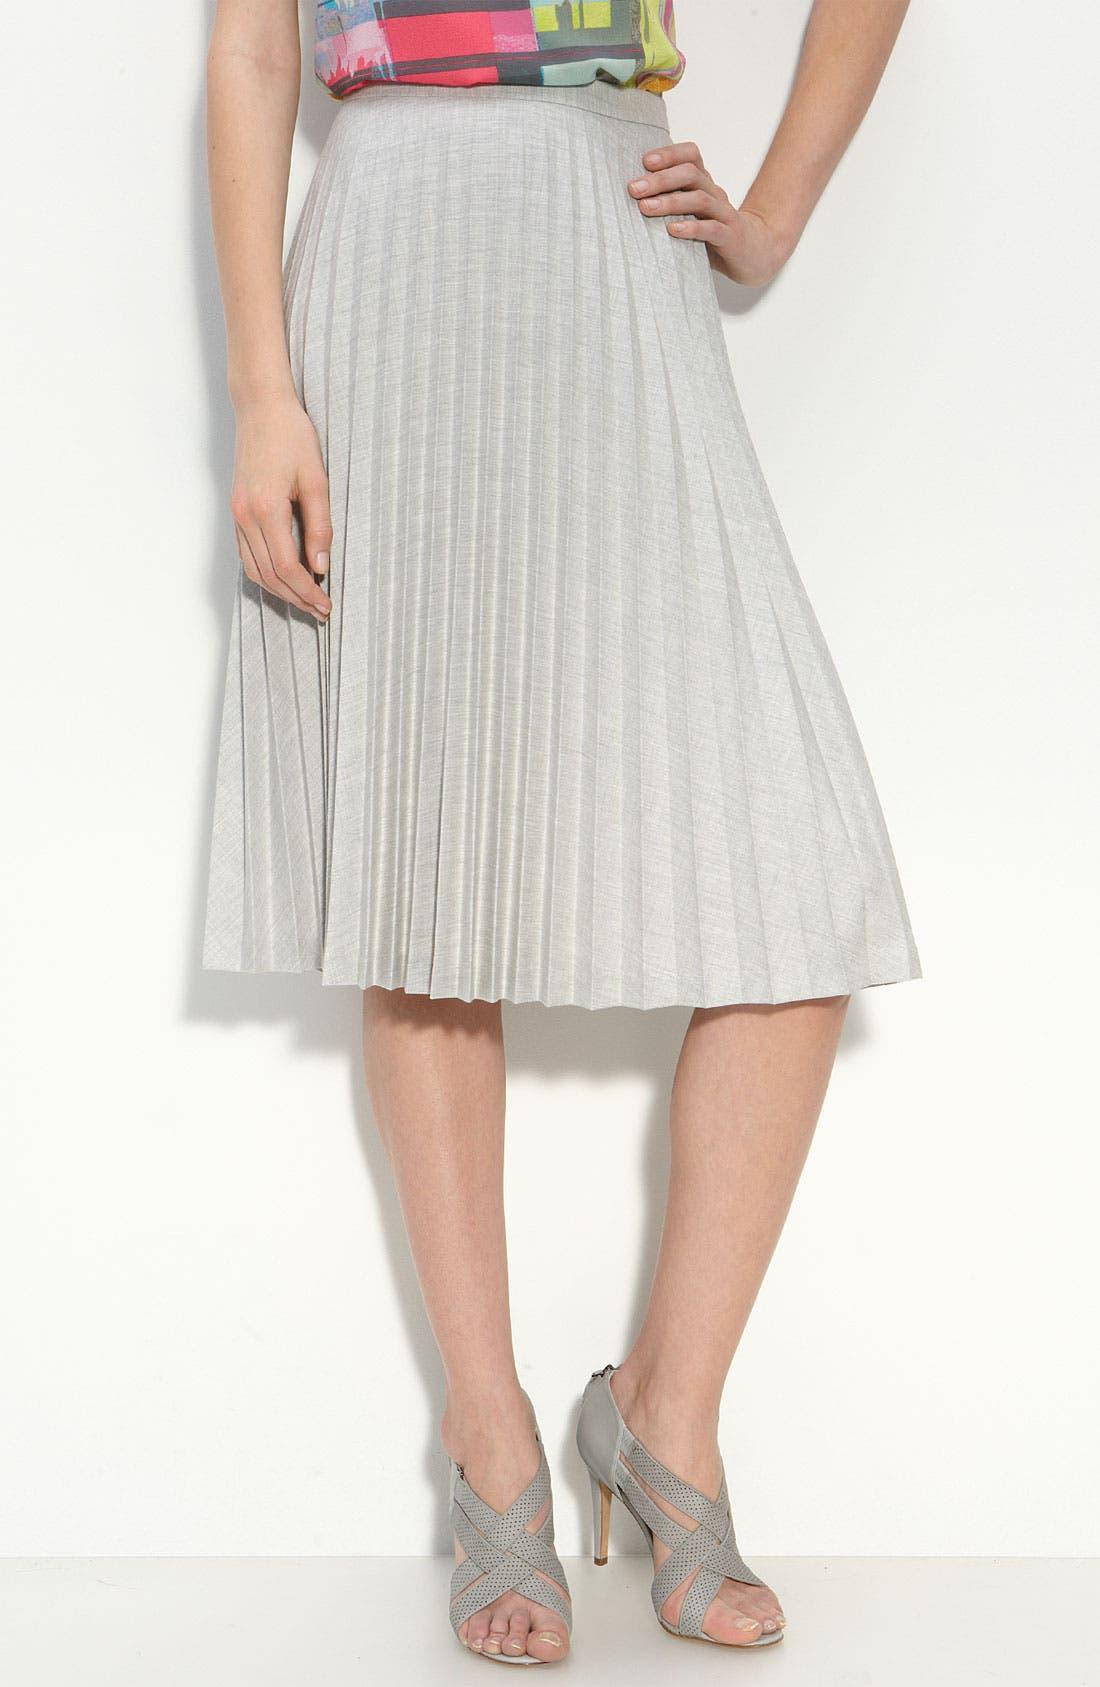 Alternate Image 1 Selected - Trina Turk 'Shaye' Skirt